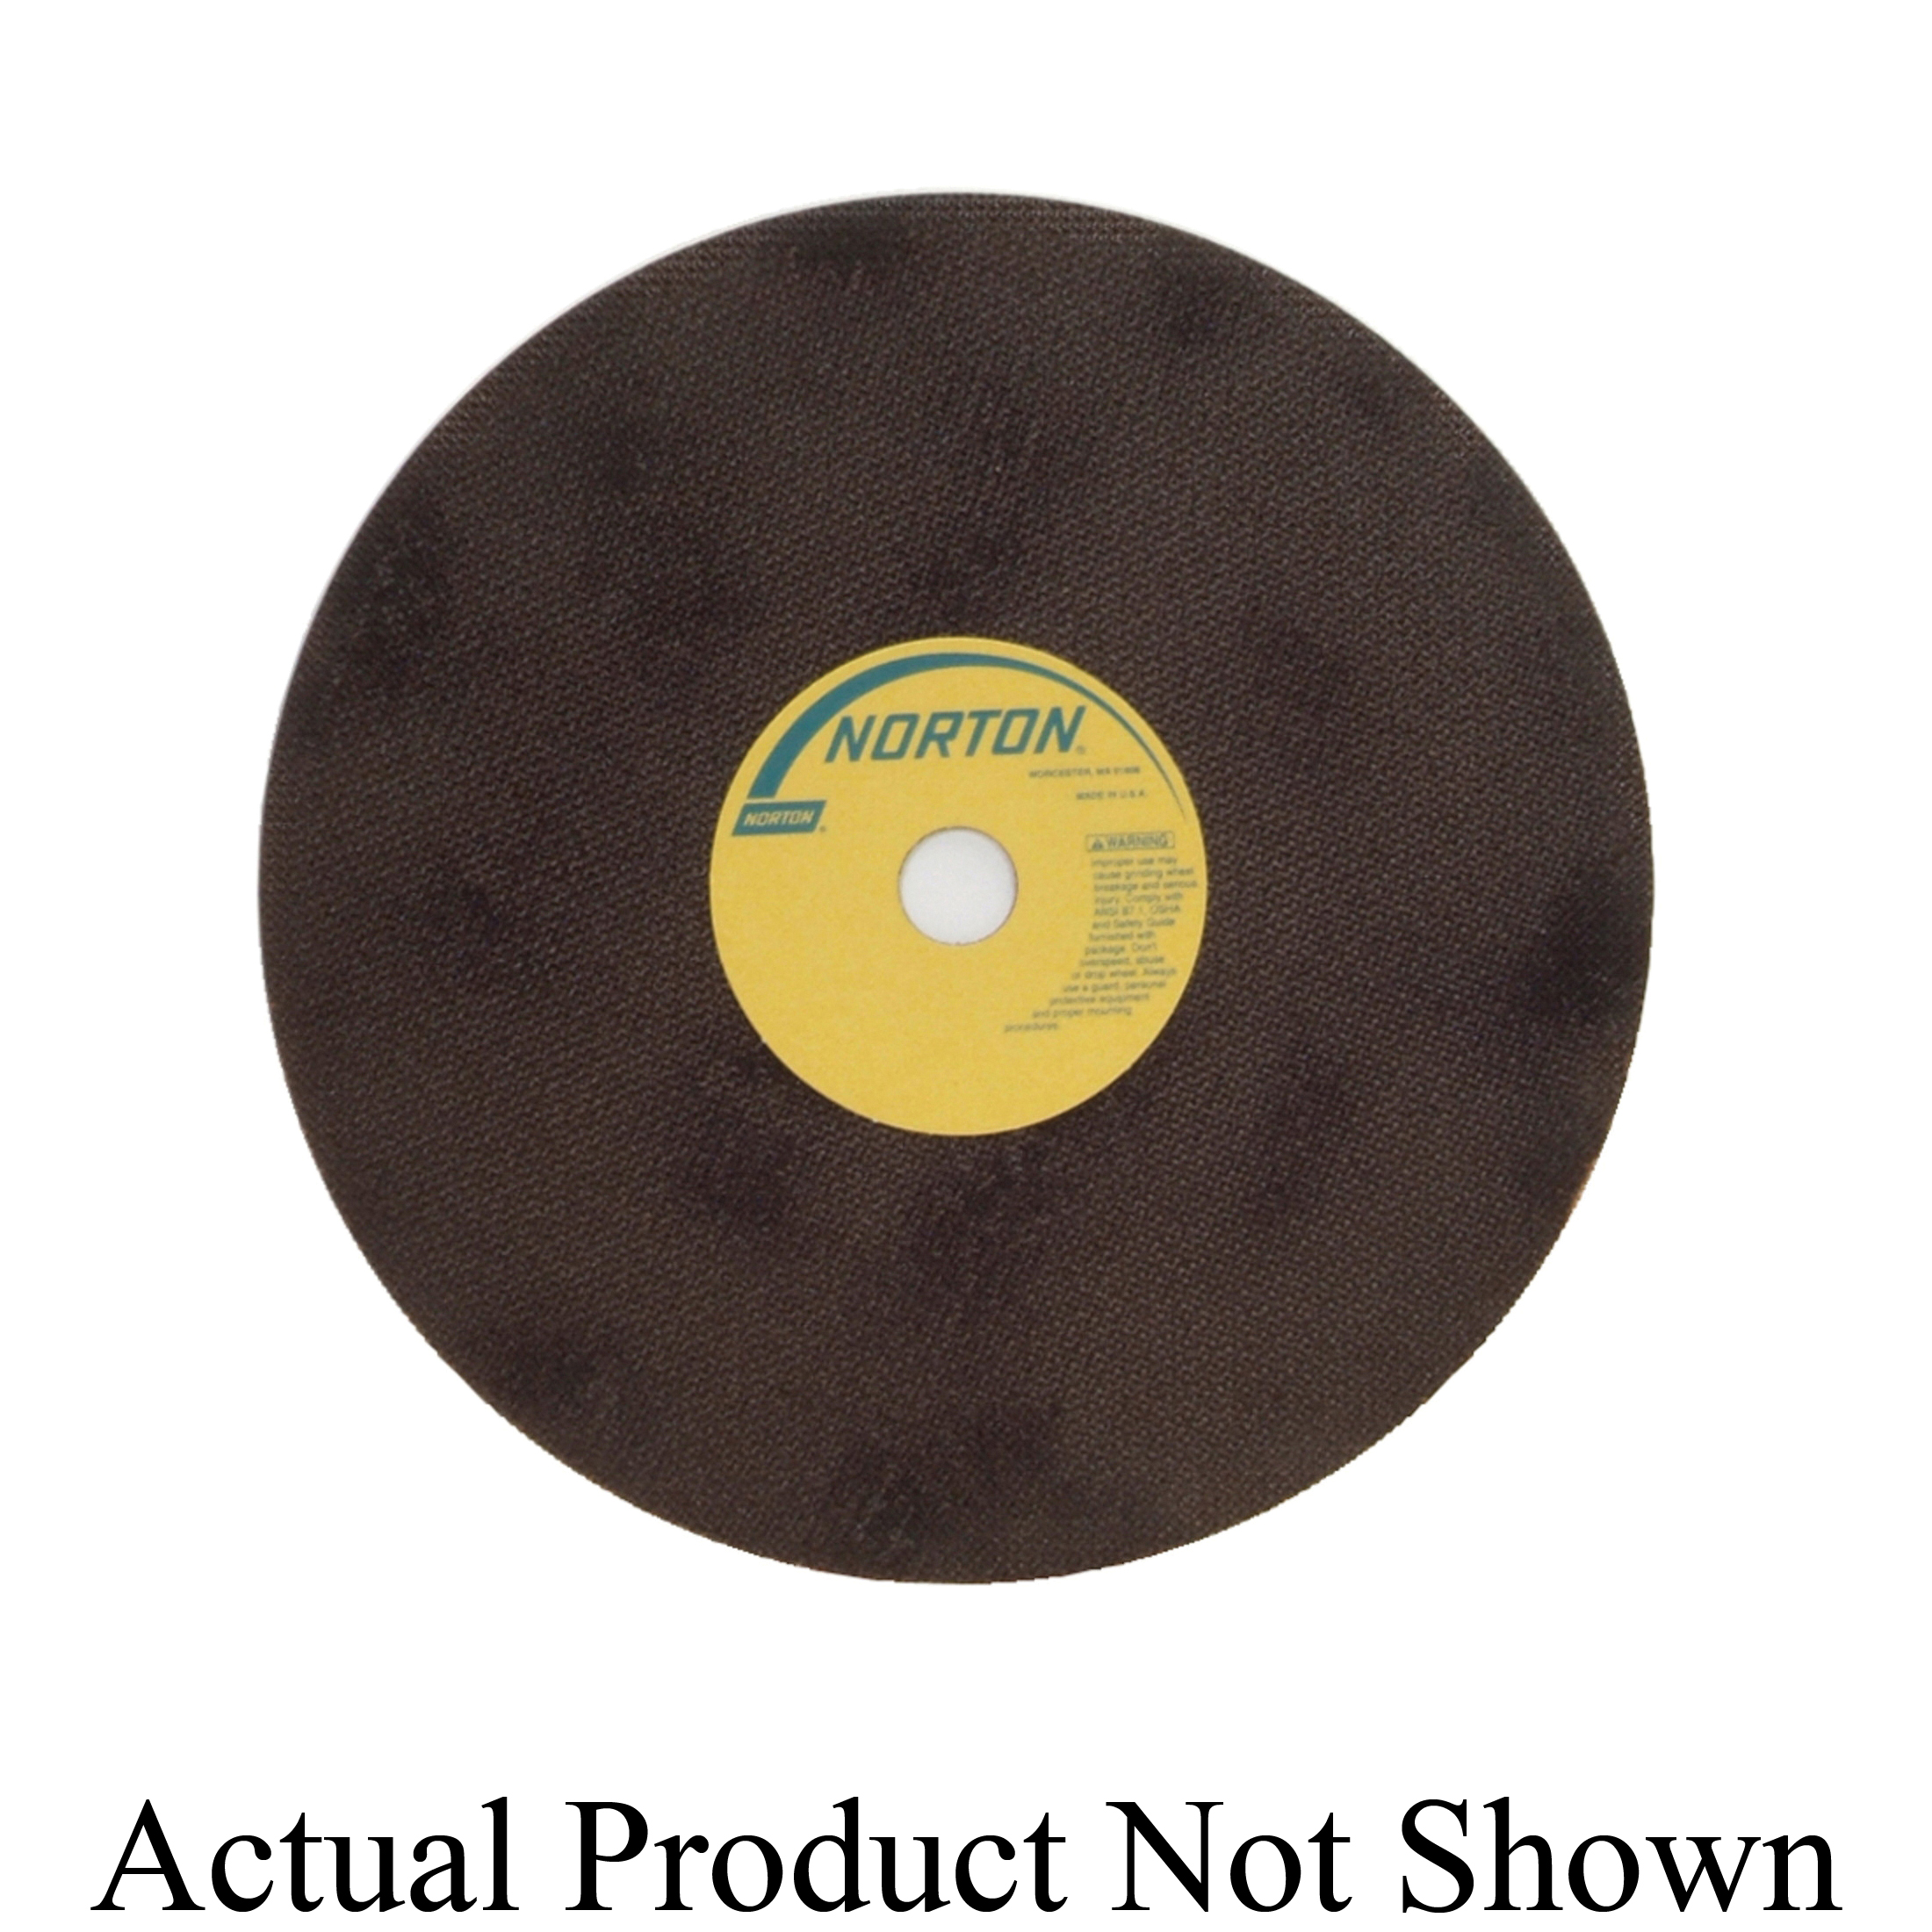 Norton® 66253261811 OBNA2 Toolroom Cut-Off Wheel, 12 in Dia x 0.06 in THK, 1 in Center Hole, 60 Grit, Aluminum Oxide Abrasive